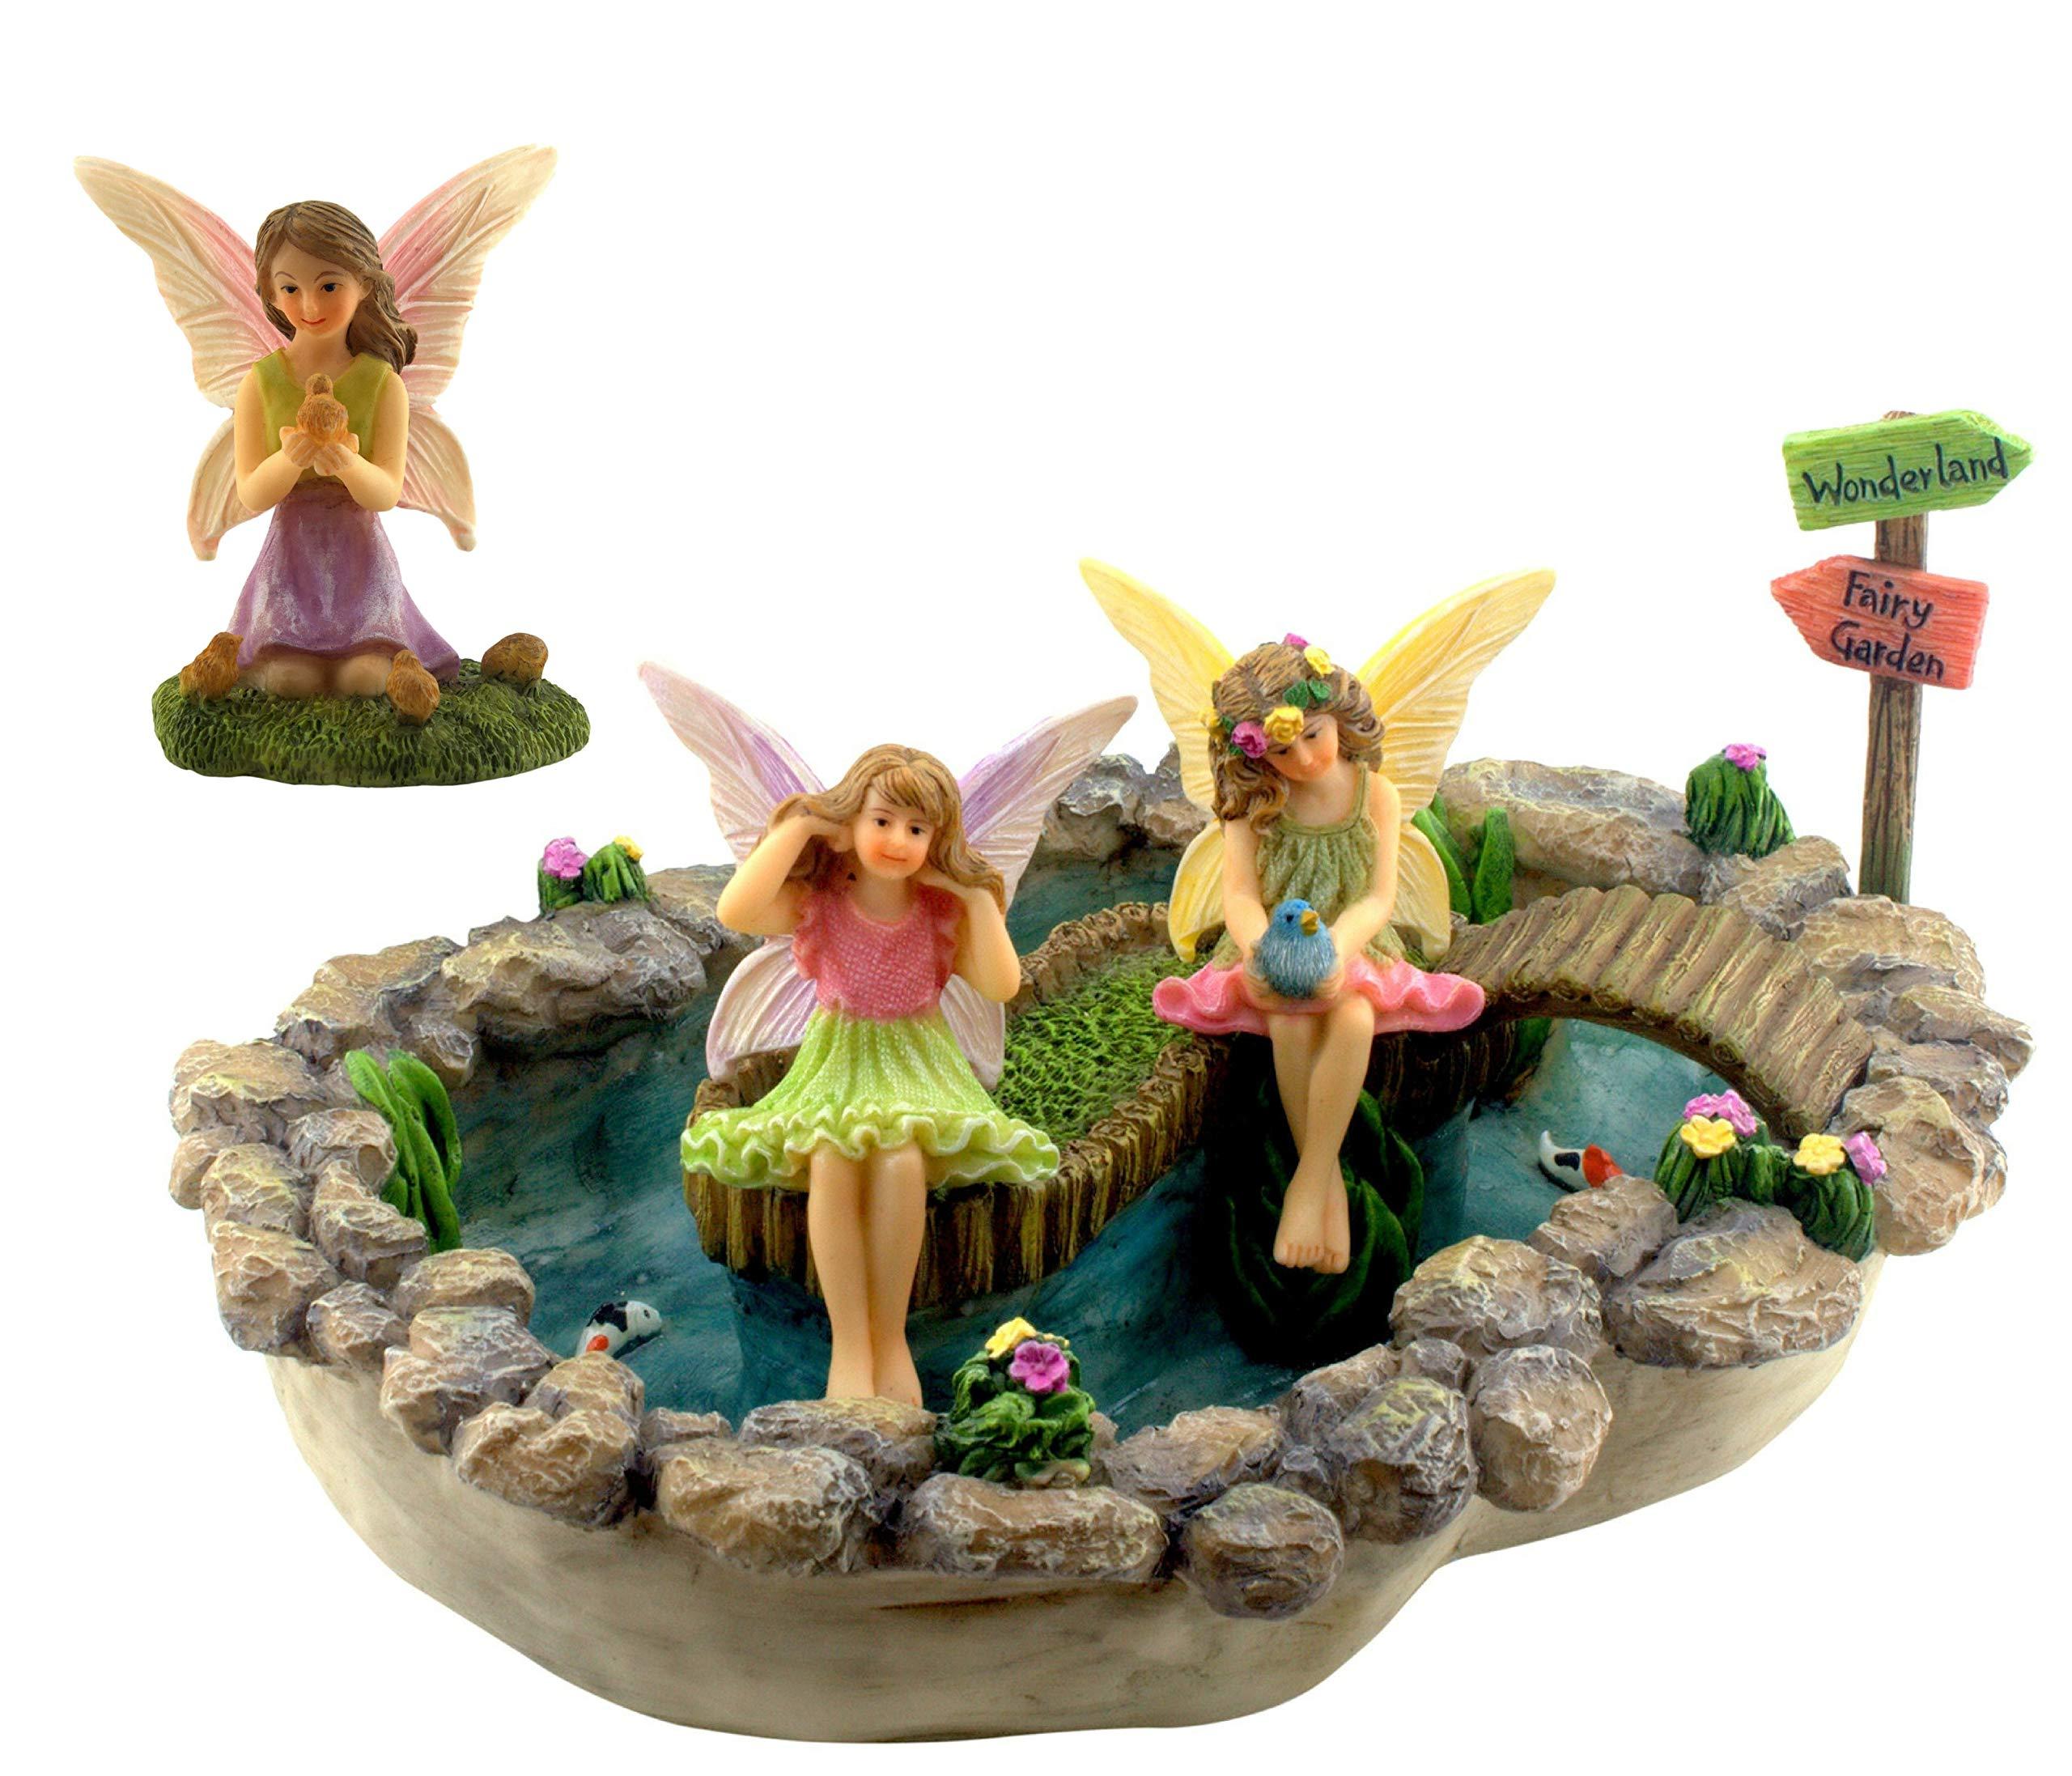 Pretmanns Fairy Garden Pond Accessories - Miniature Fairies Set - 3 Figurines & Sign - Large Lily Pond (8.3'' x 6.1'') - 5 Pieces